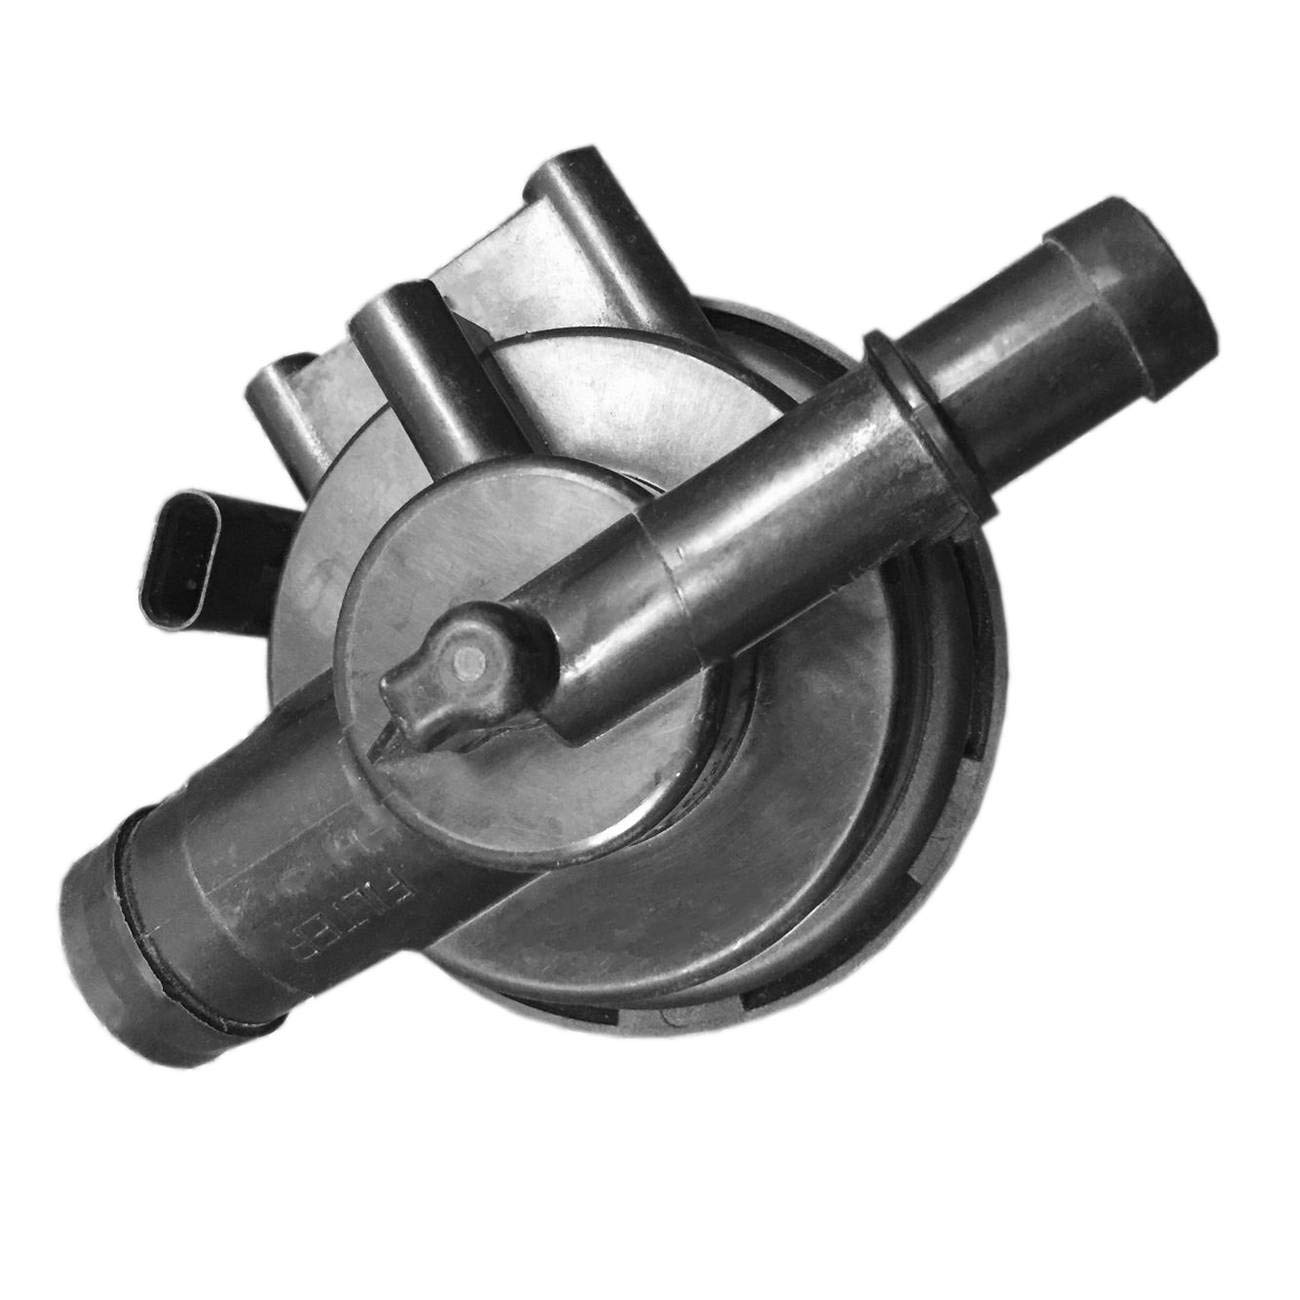 Deebior 1pc Genuine Leak Detect Diagnosis Pressure Switch/Module 16137448091 For BMW 528 535 550 640 650 740 750 M5 M6 X3 X4 X5 X6 / Mini Cooper Cooper Countryman Cooper Paceman by Deebior (Image #4)